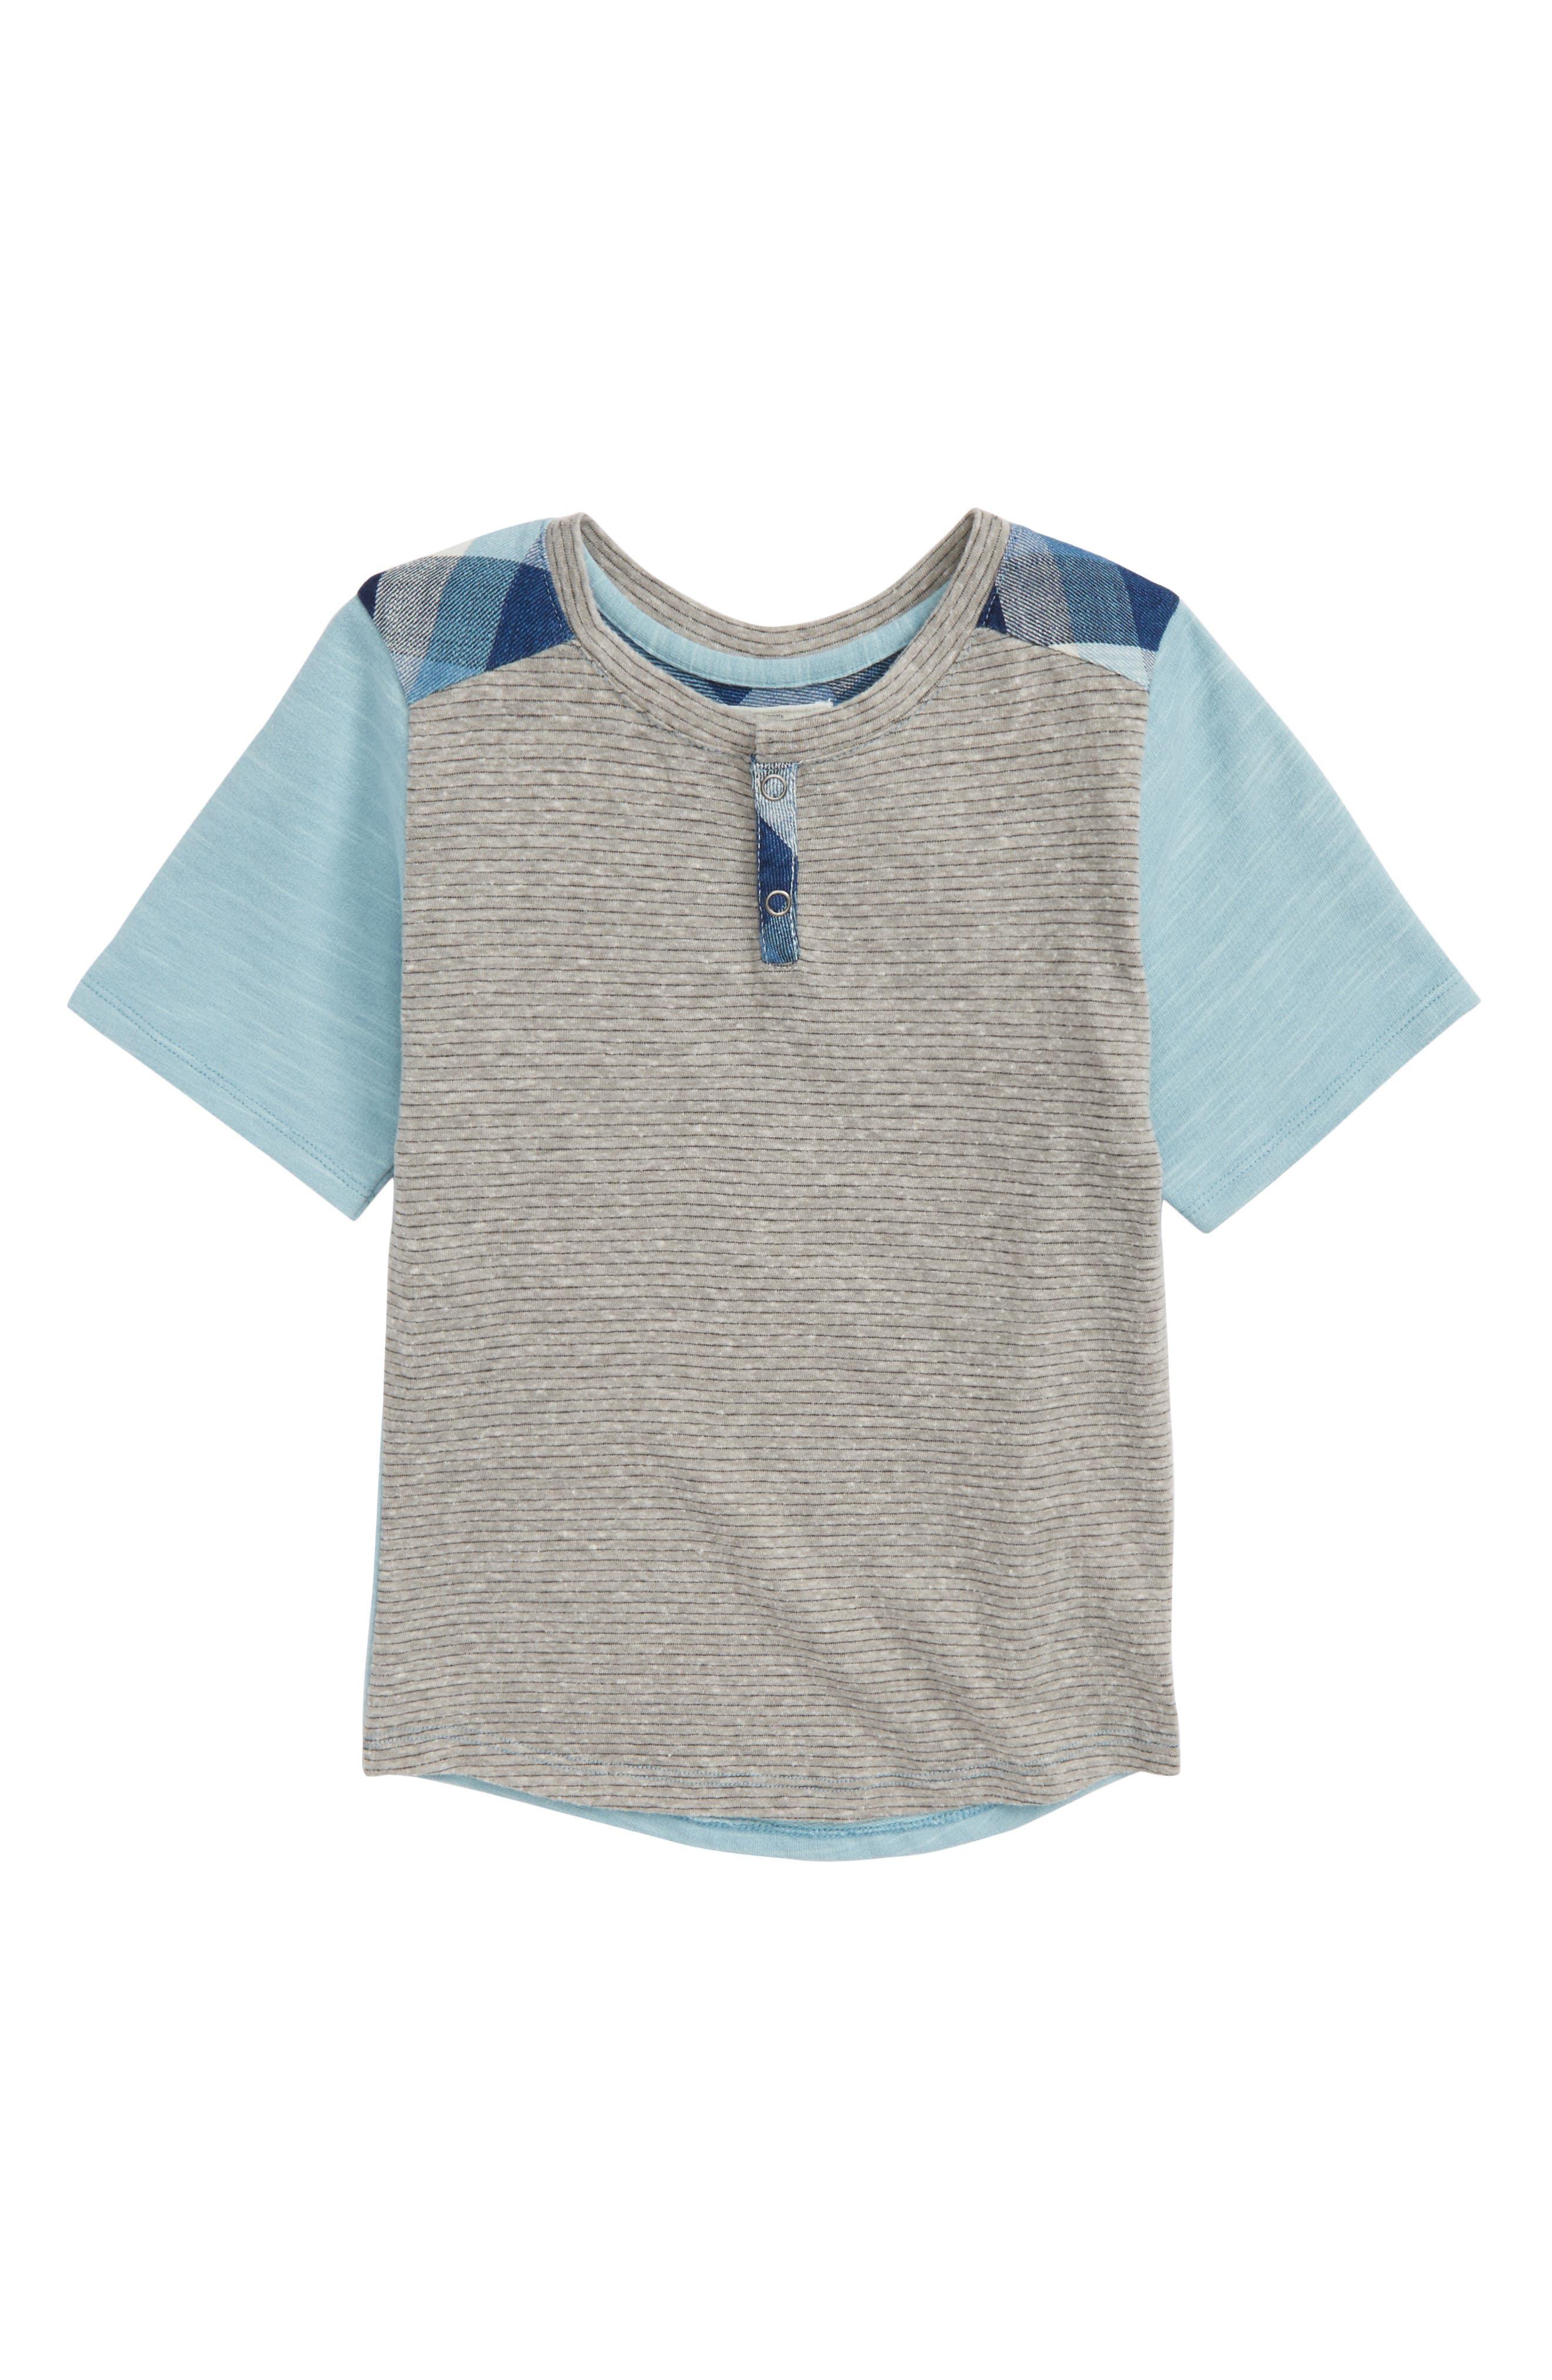 Phoenix Henley Shirt,                         Main,                         color, 020